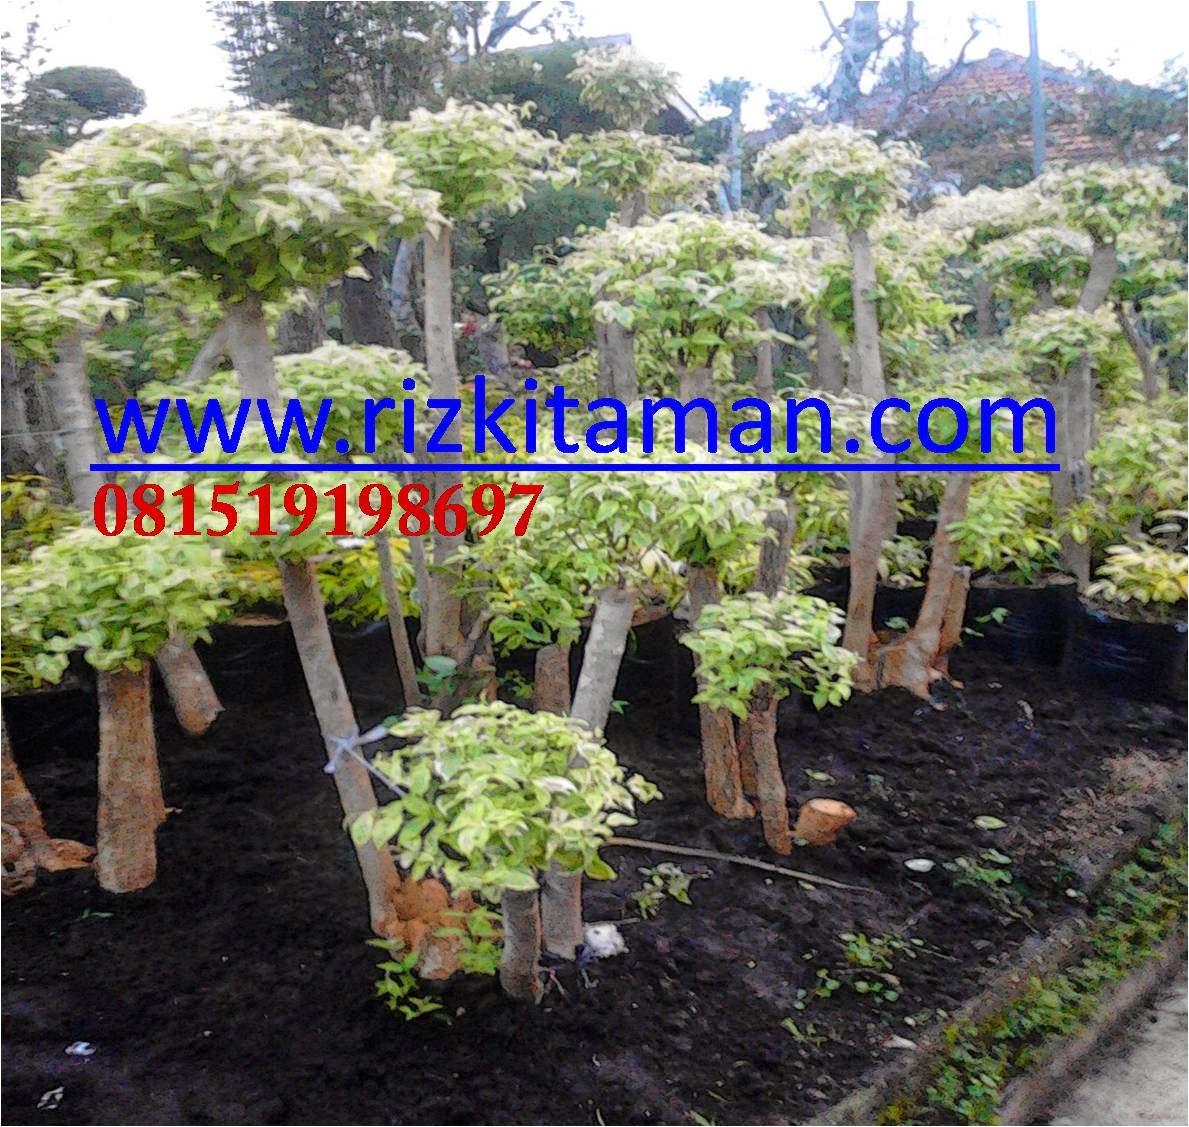 Jual bonsai anting putri | suplier tanaman bonsai dan bunga | tukang taman